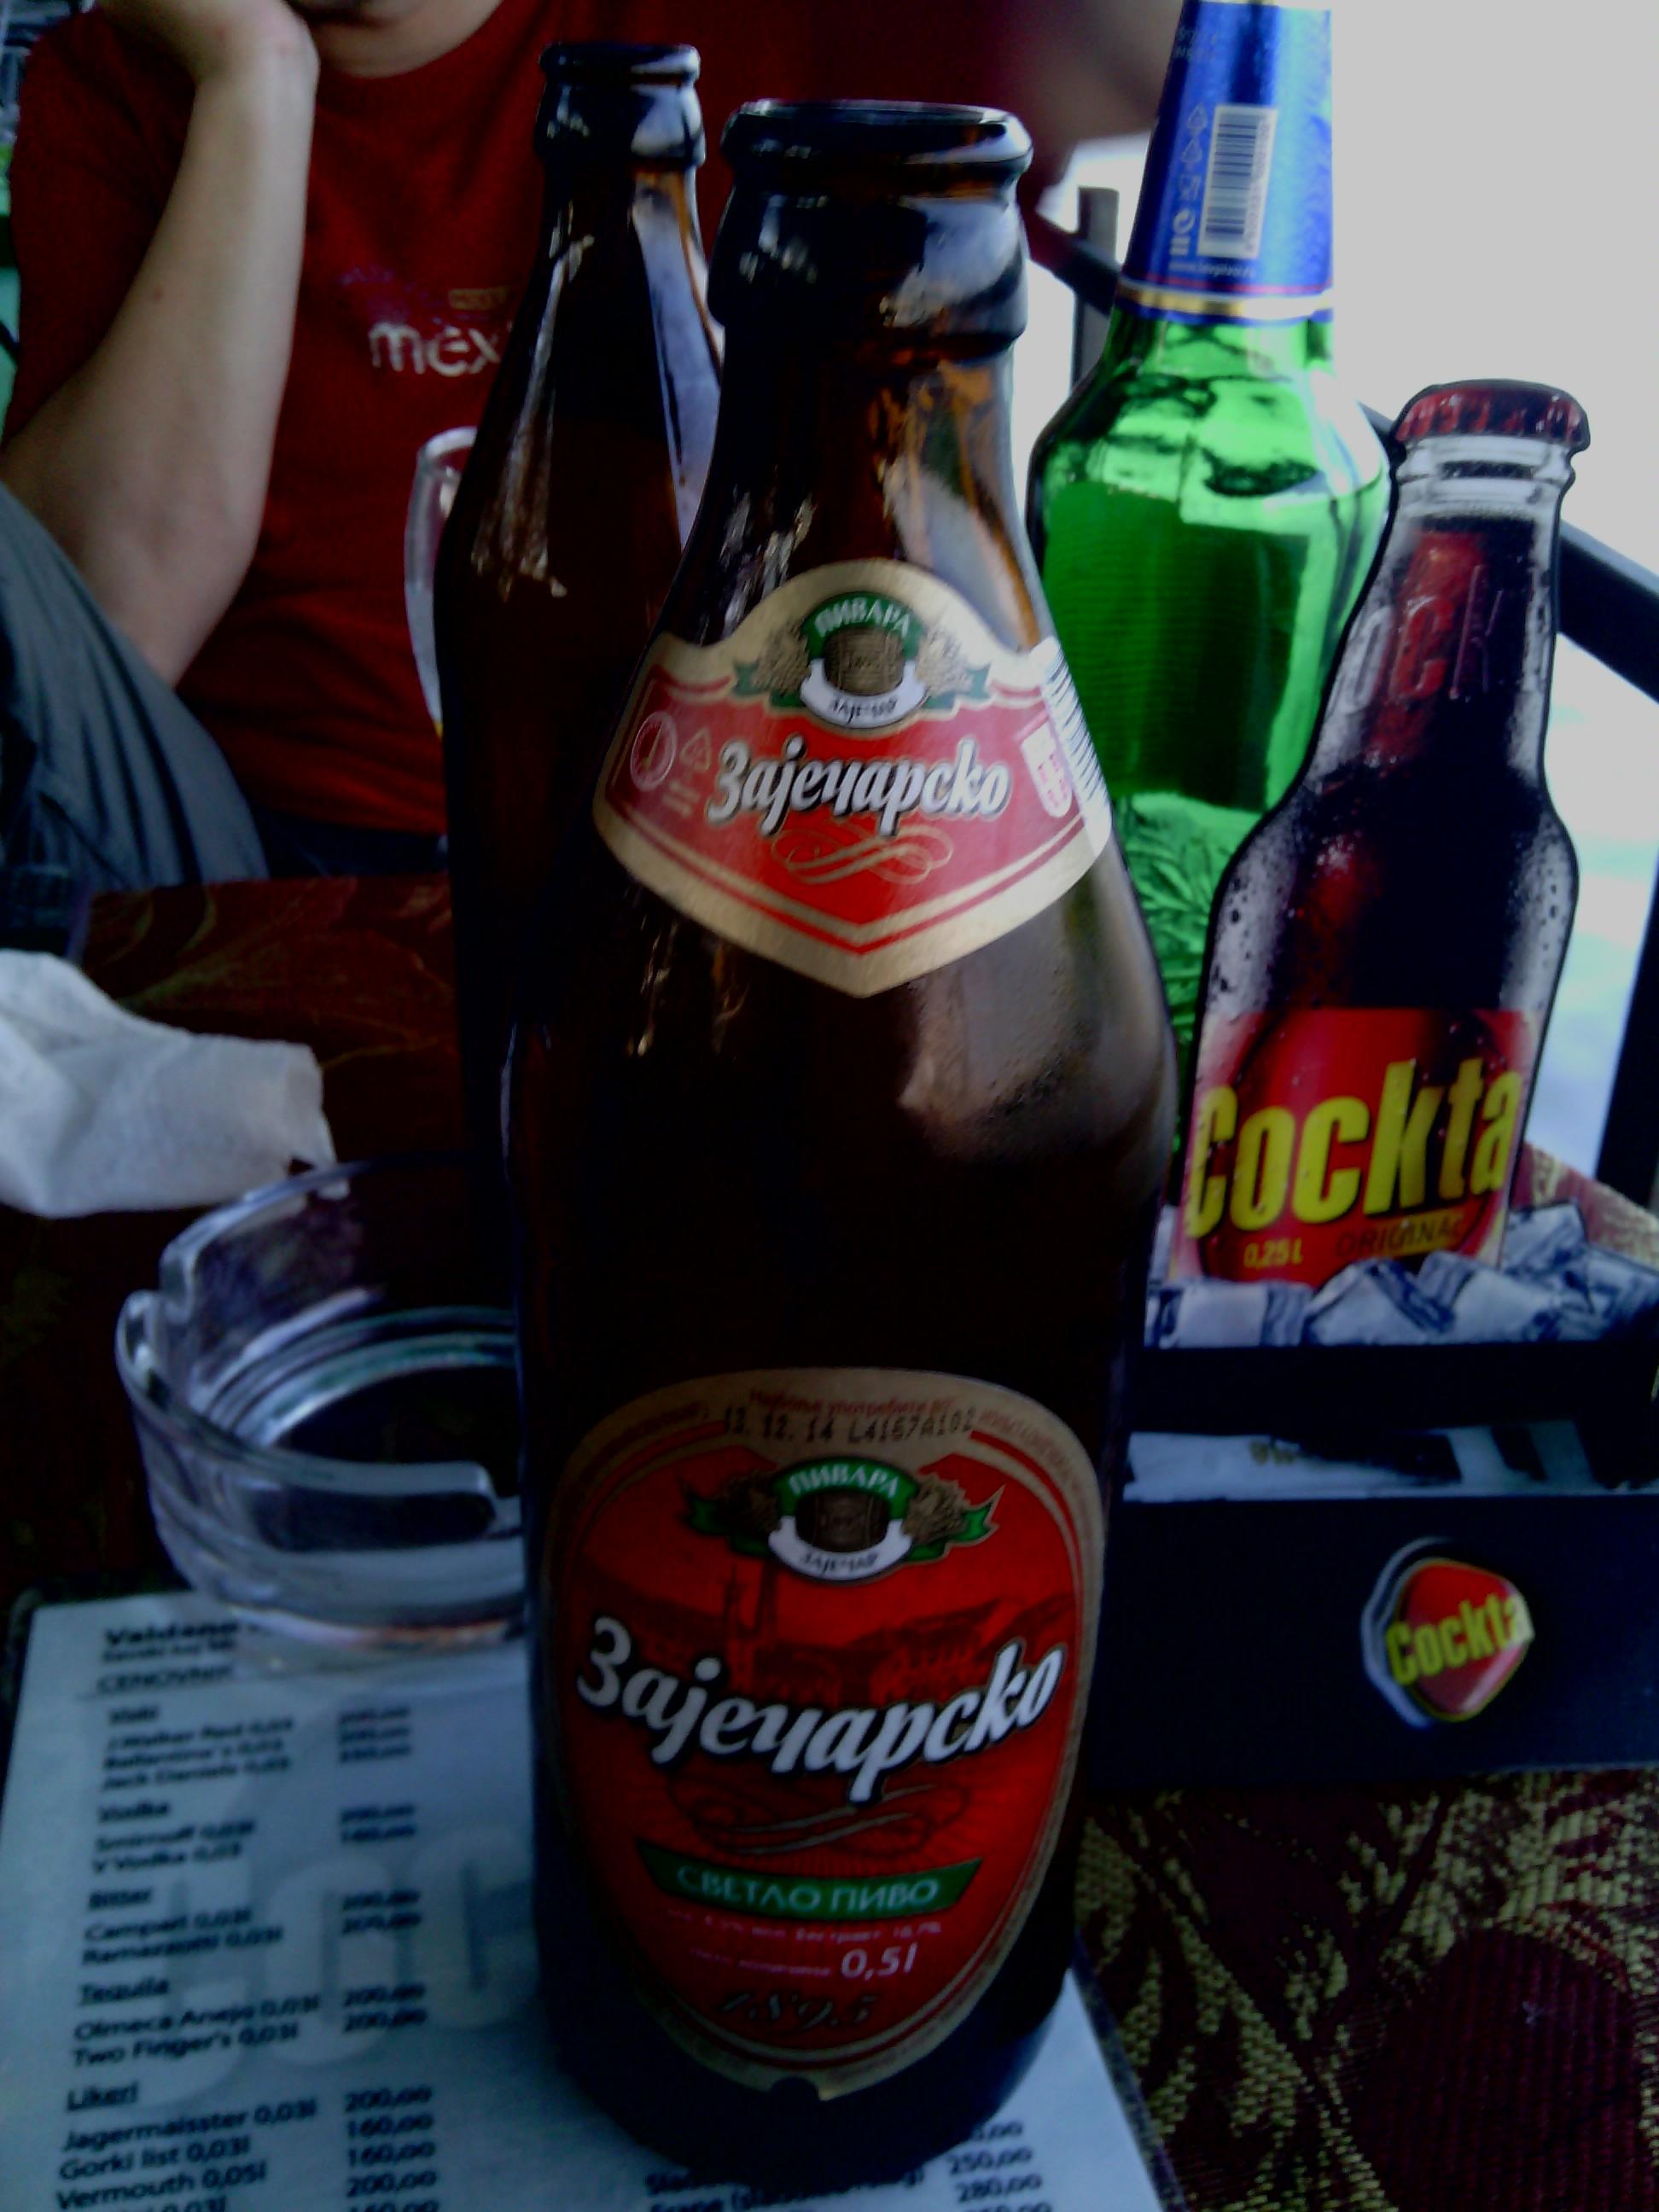 Rabbit drink / Zaicharsko Serbian beer